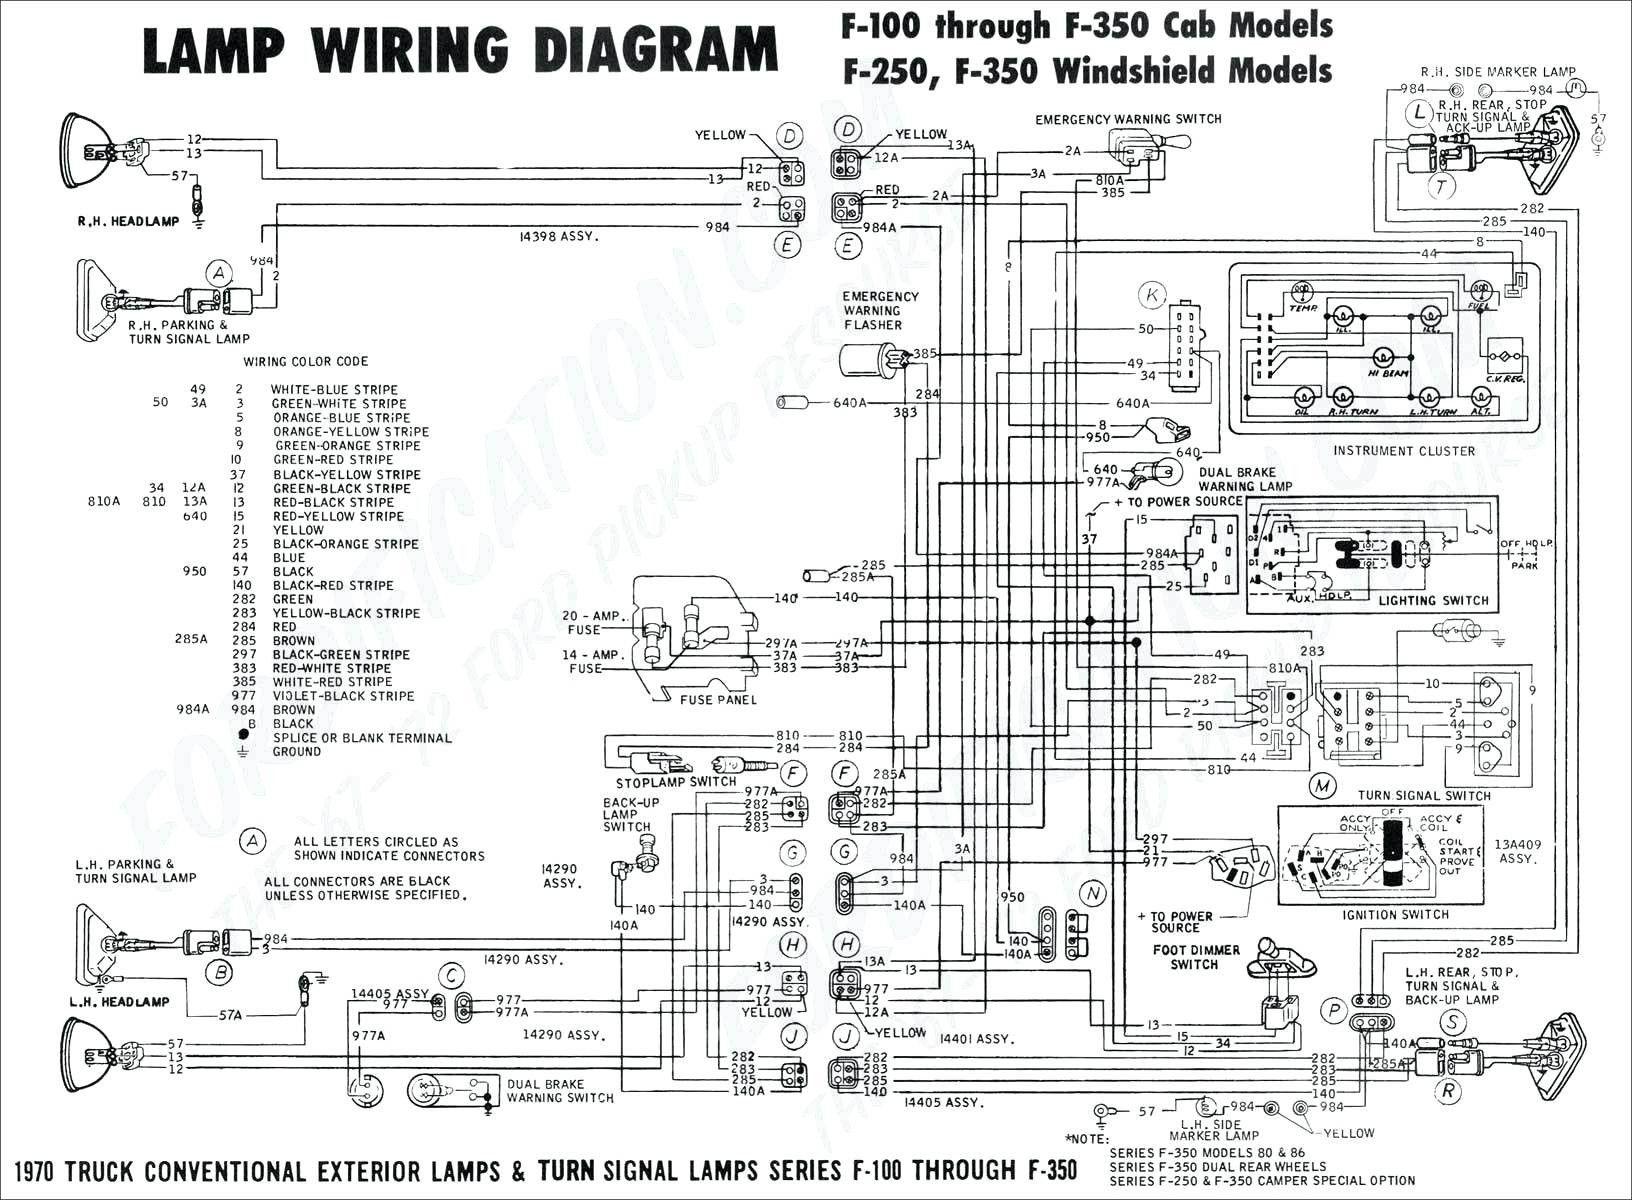 2000 Mercury Mountaineer Engine Diagram Honda Accord Nissan Maxima Radio